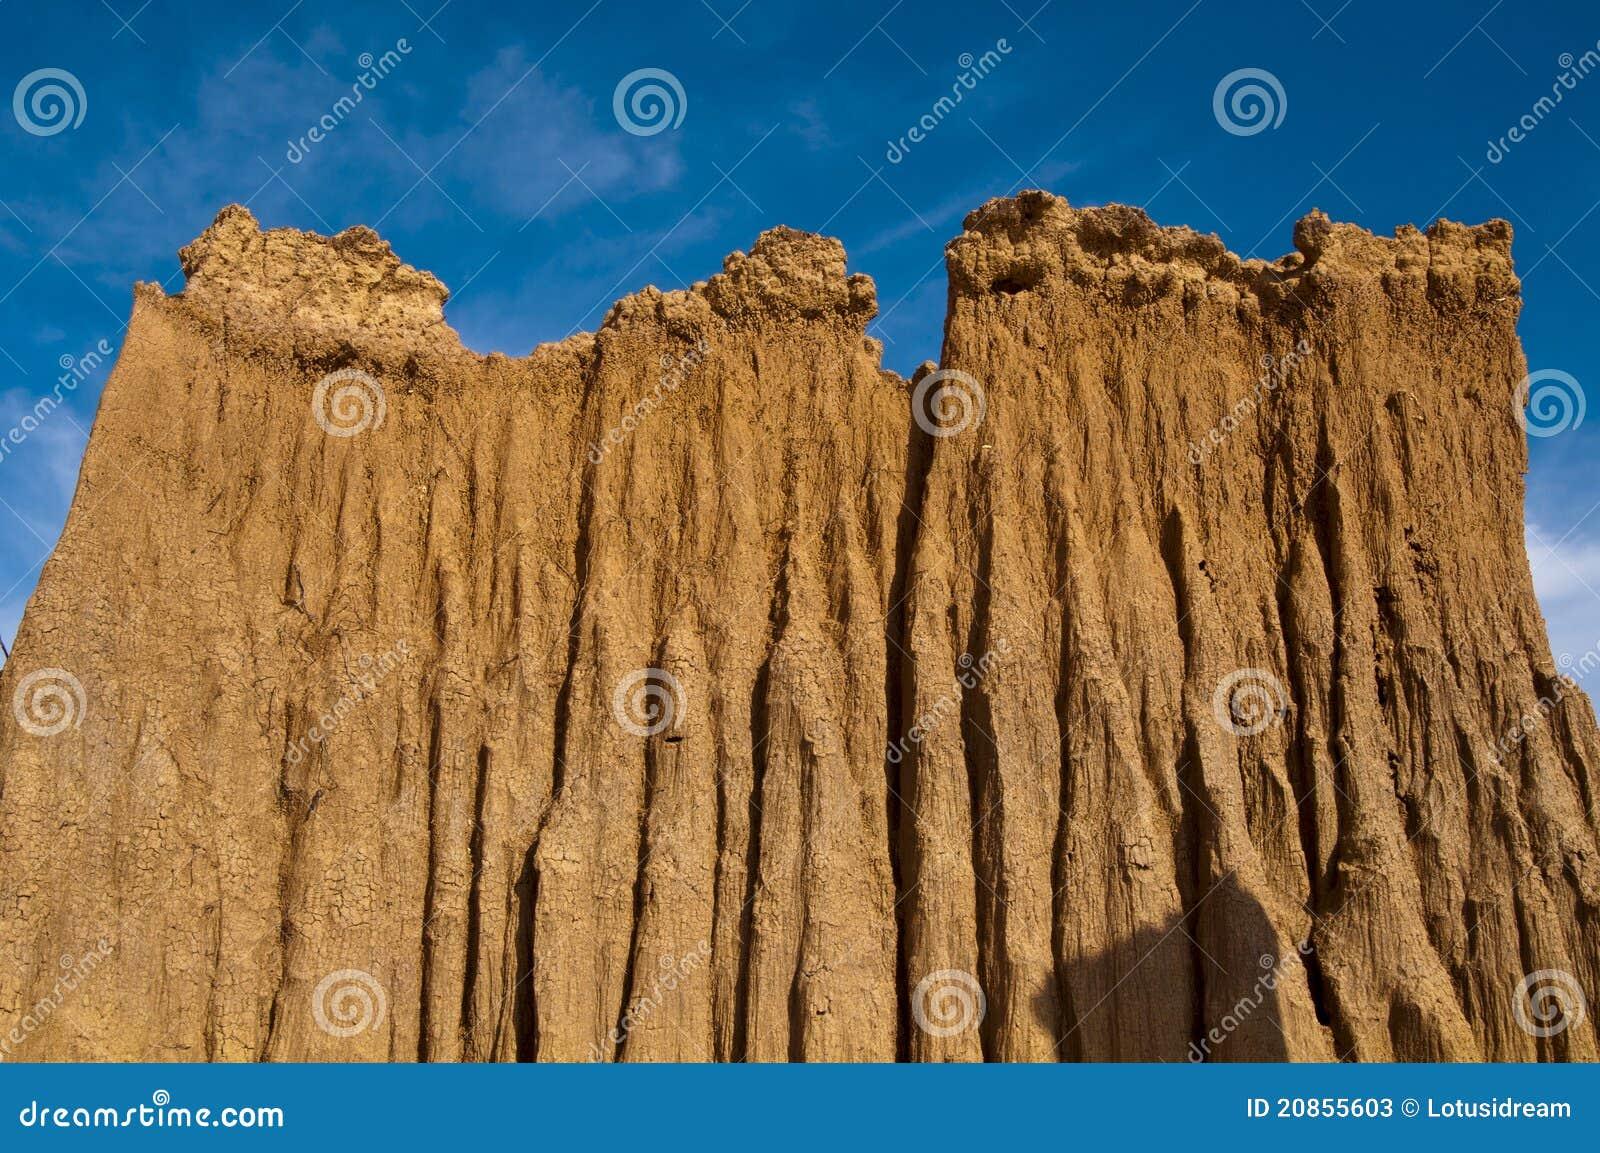 Mountain soil stock image. Image of sand, heat, park ...